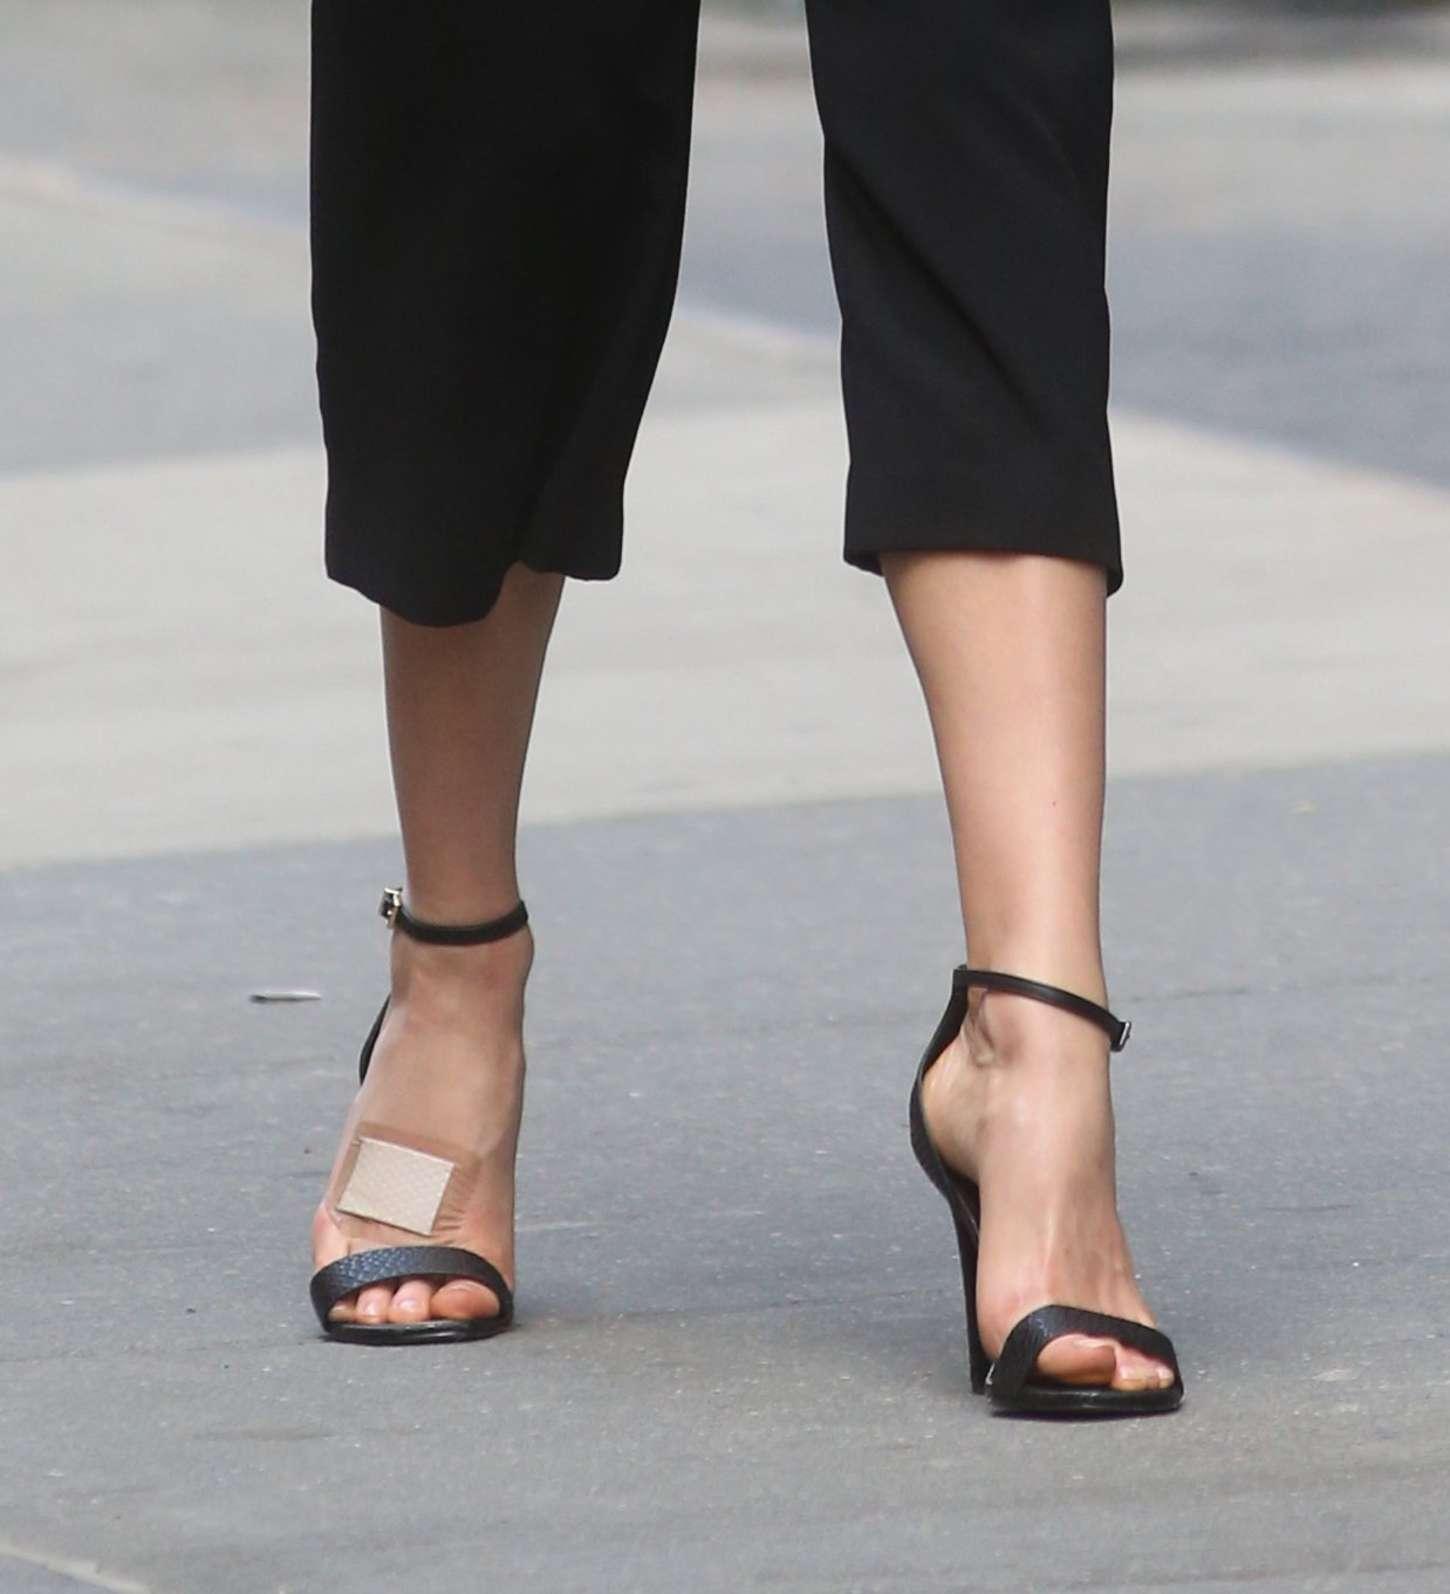 Karlie Kloss 2015 : Karlie Kloss: Photoshoot in NYC -38